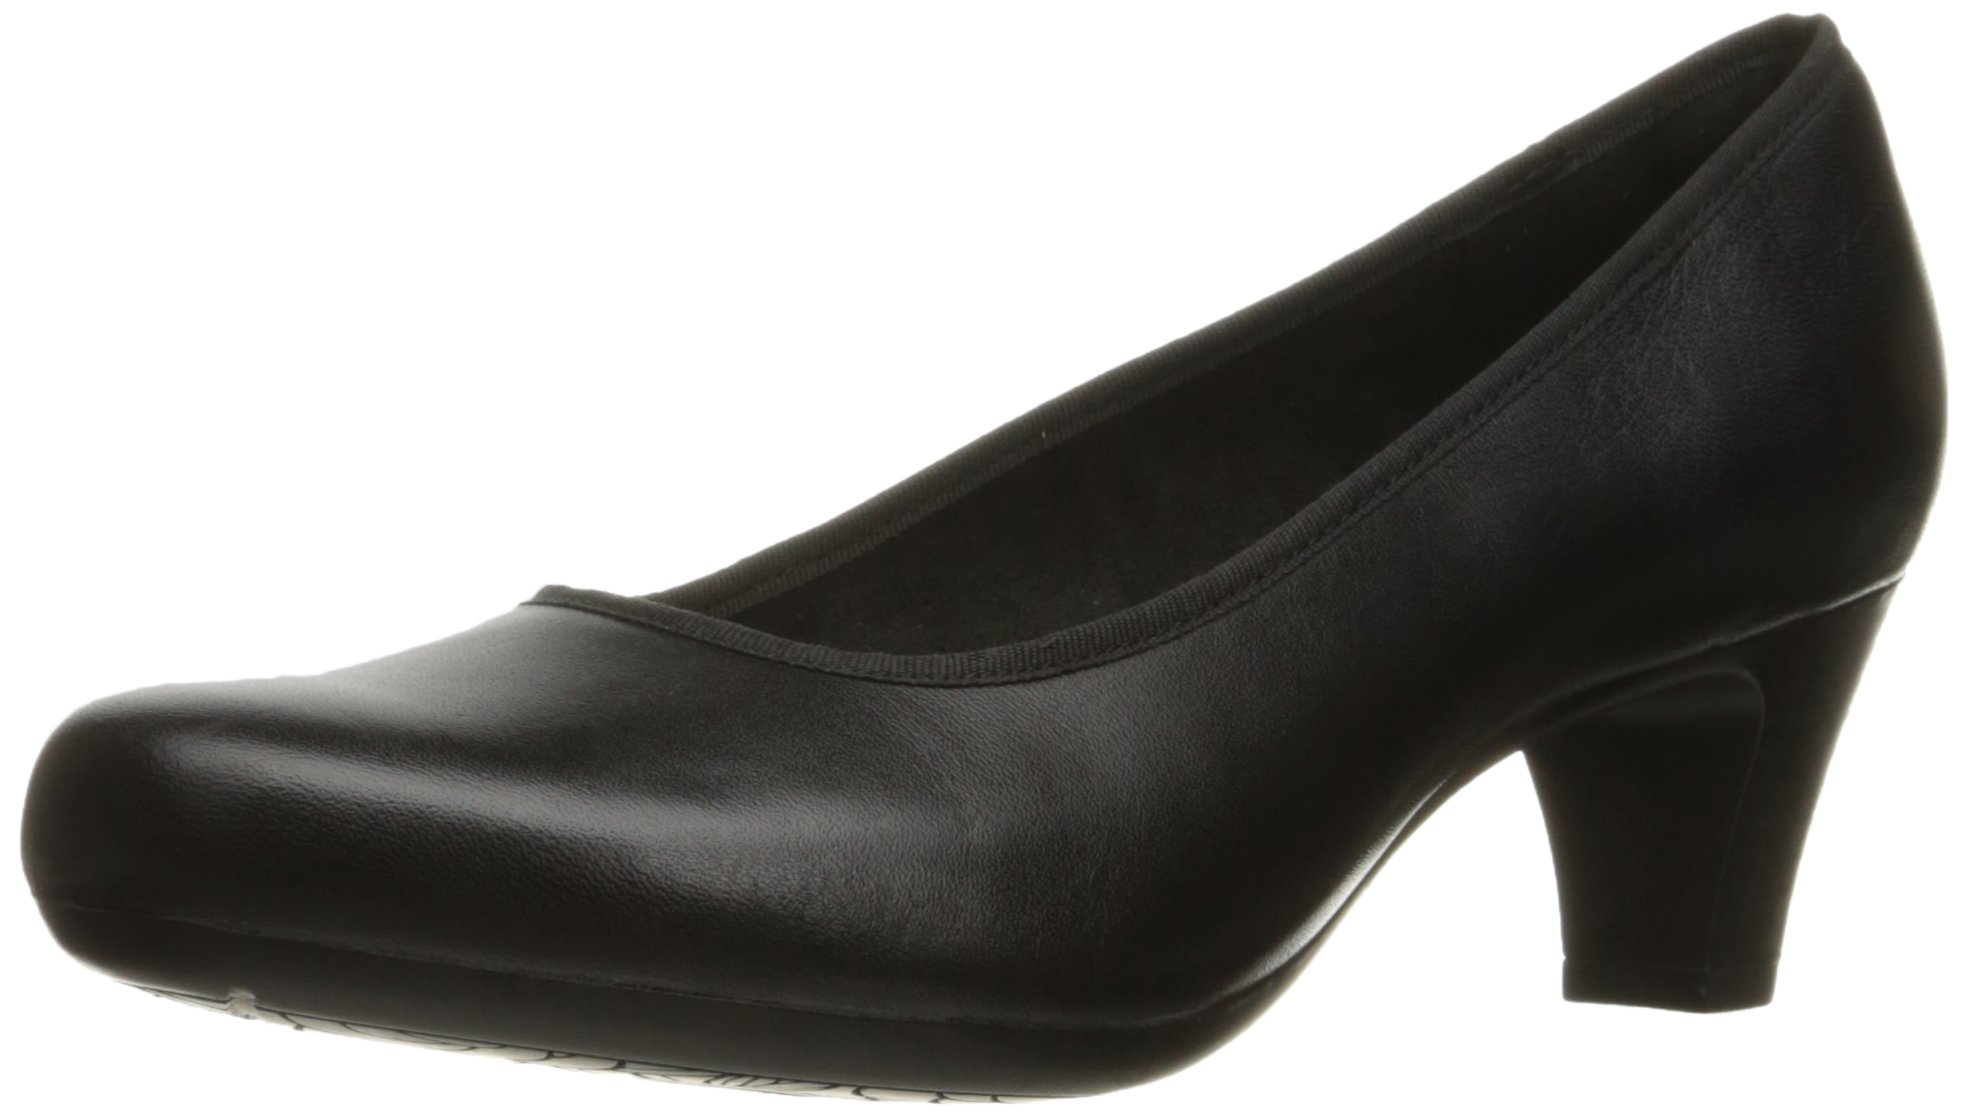 Rockport Women's Hezra Dress Pump, Black Leather, 11 M US